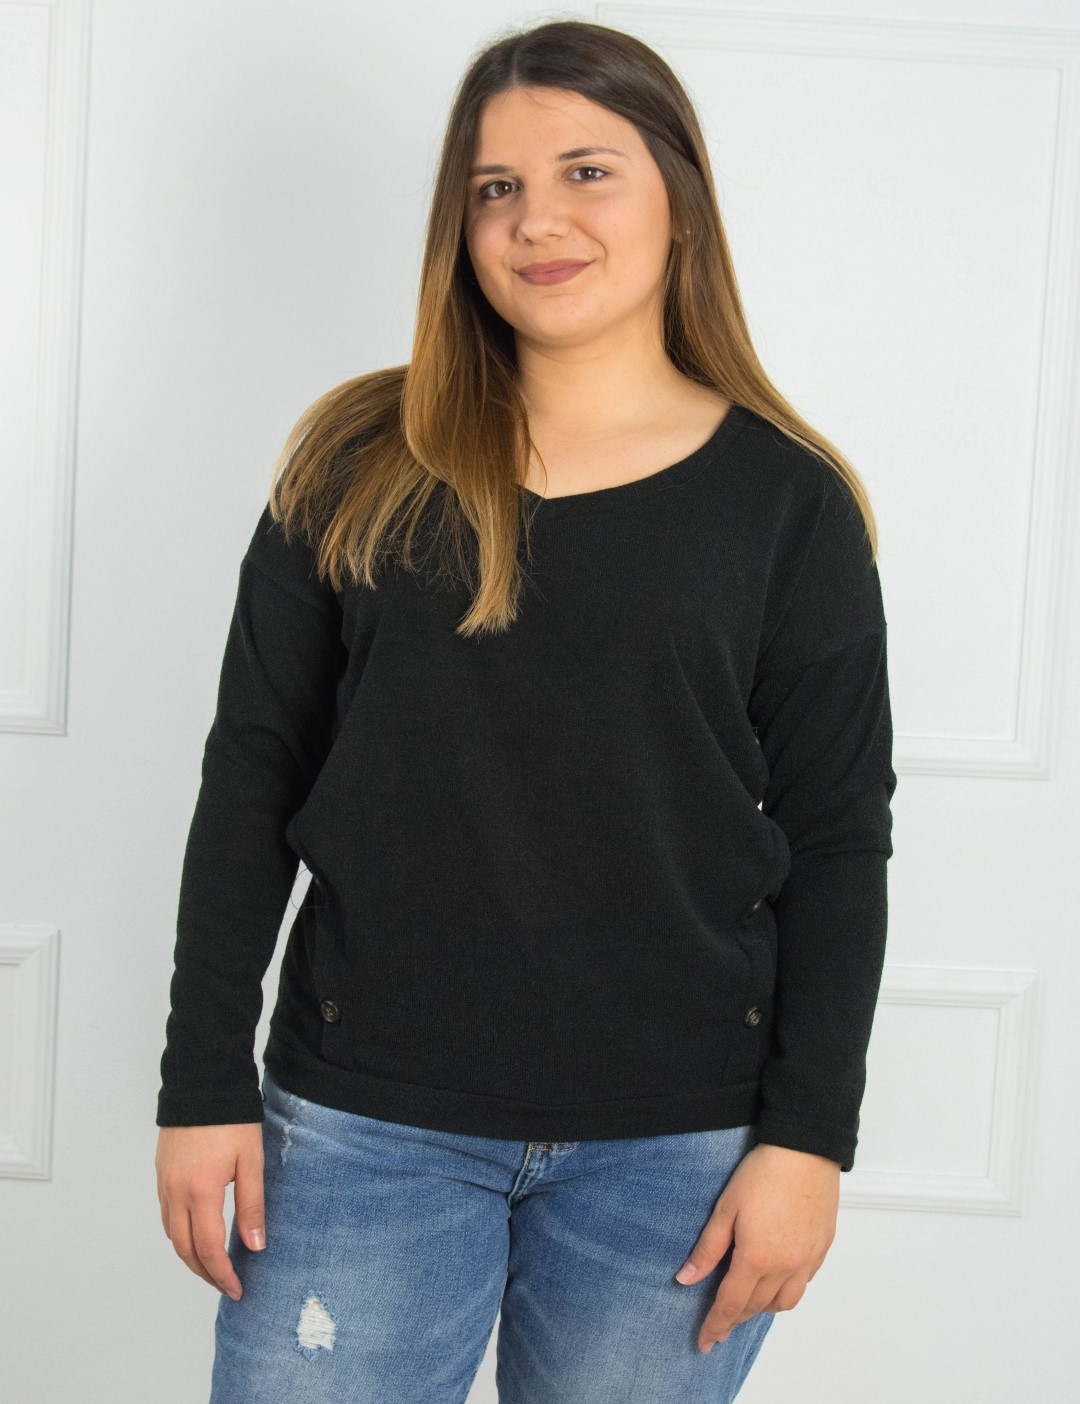 5e6062786798 Γυναικεία μαύρη μακρυμάνικη μπλούζα κουμπιά Honey 39530